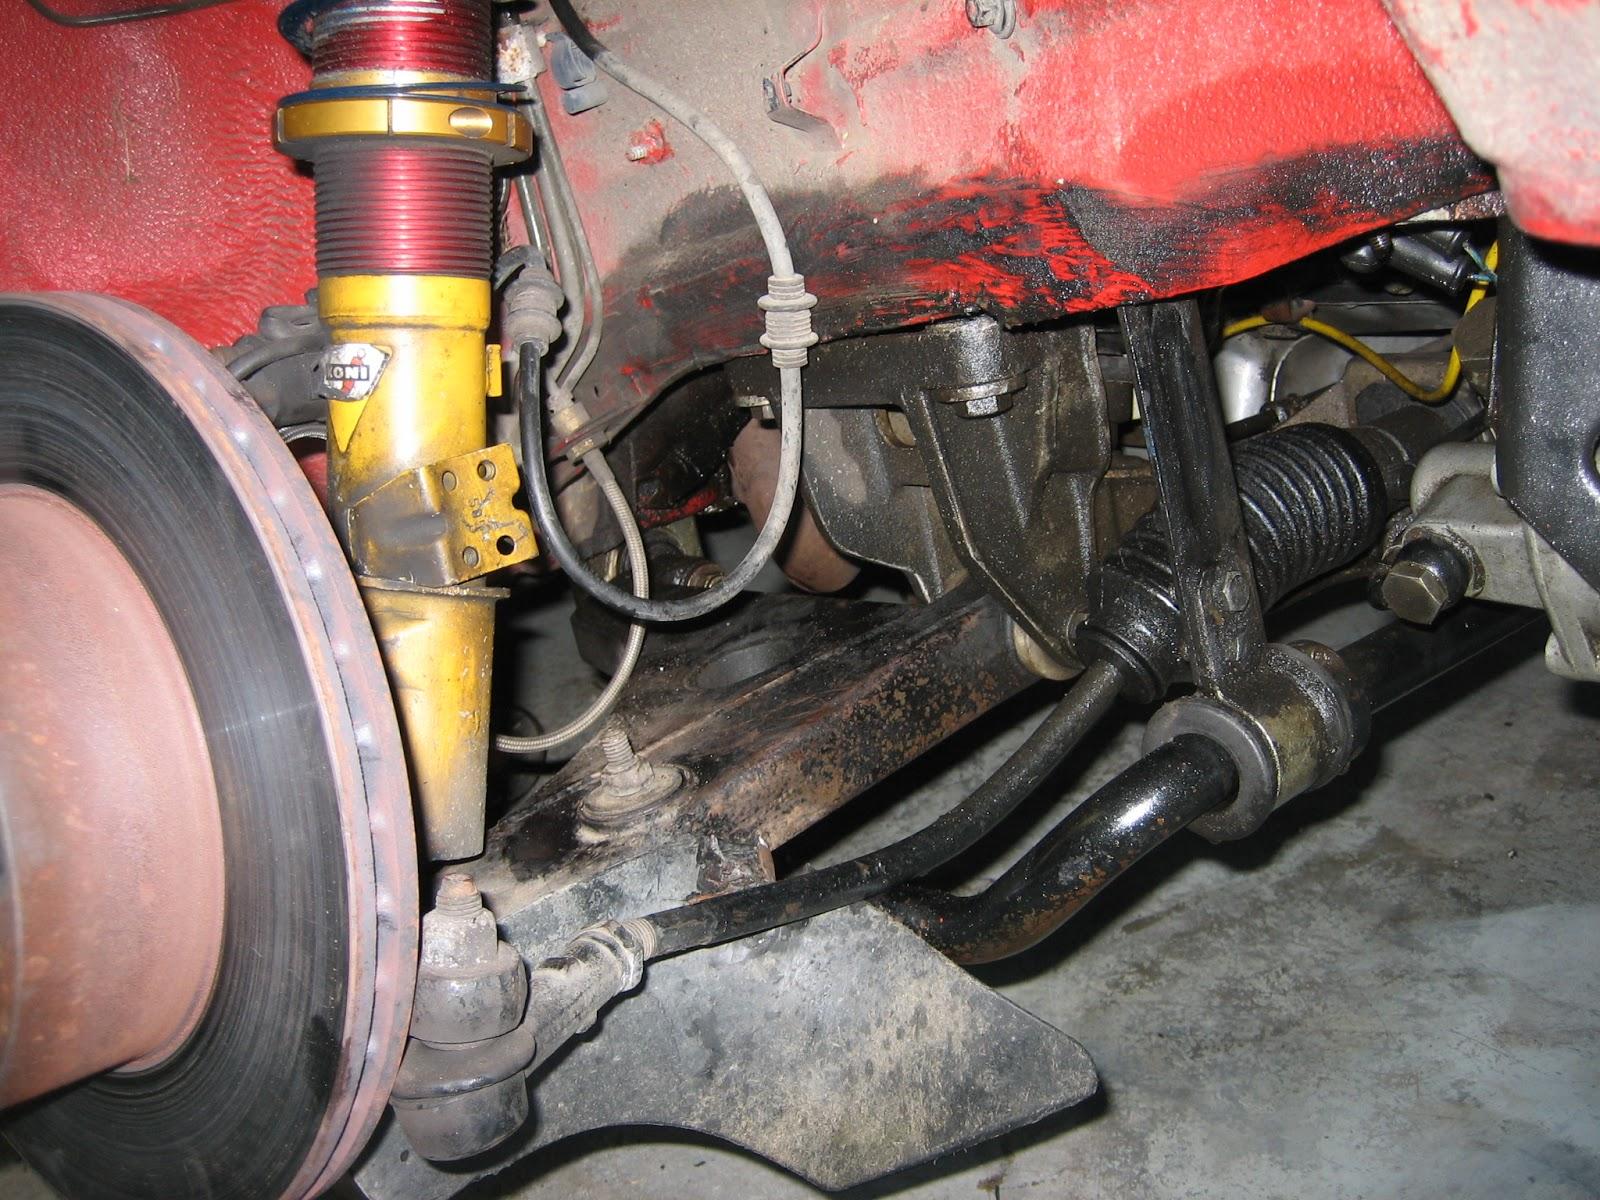 944 Racecar - Crash Repair 2006-2007 | the alpine garage